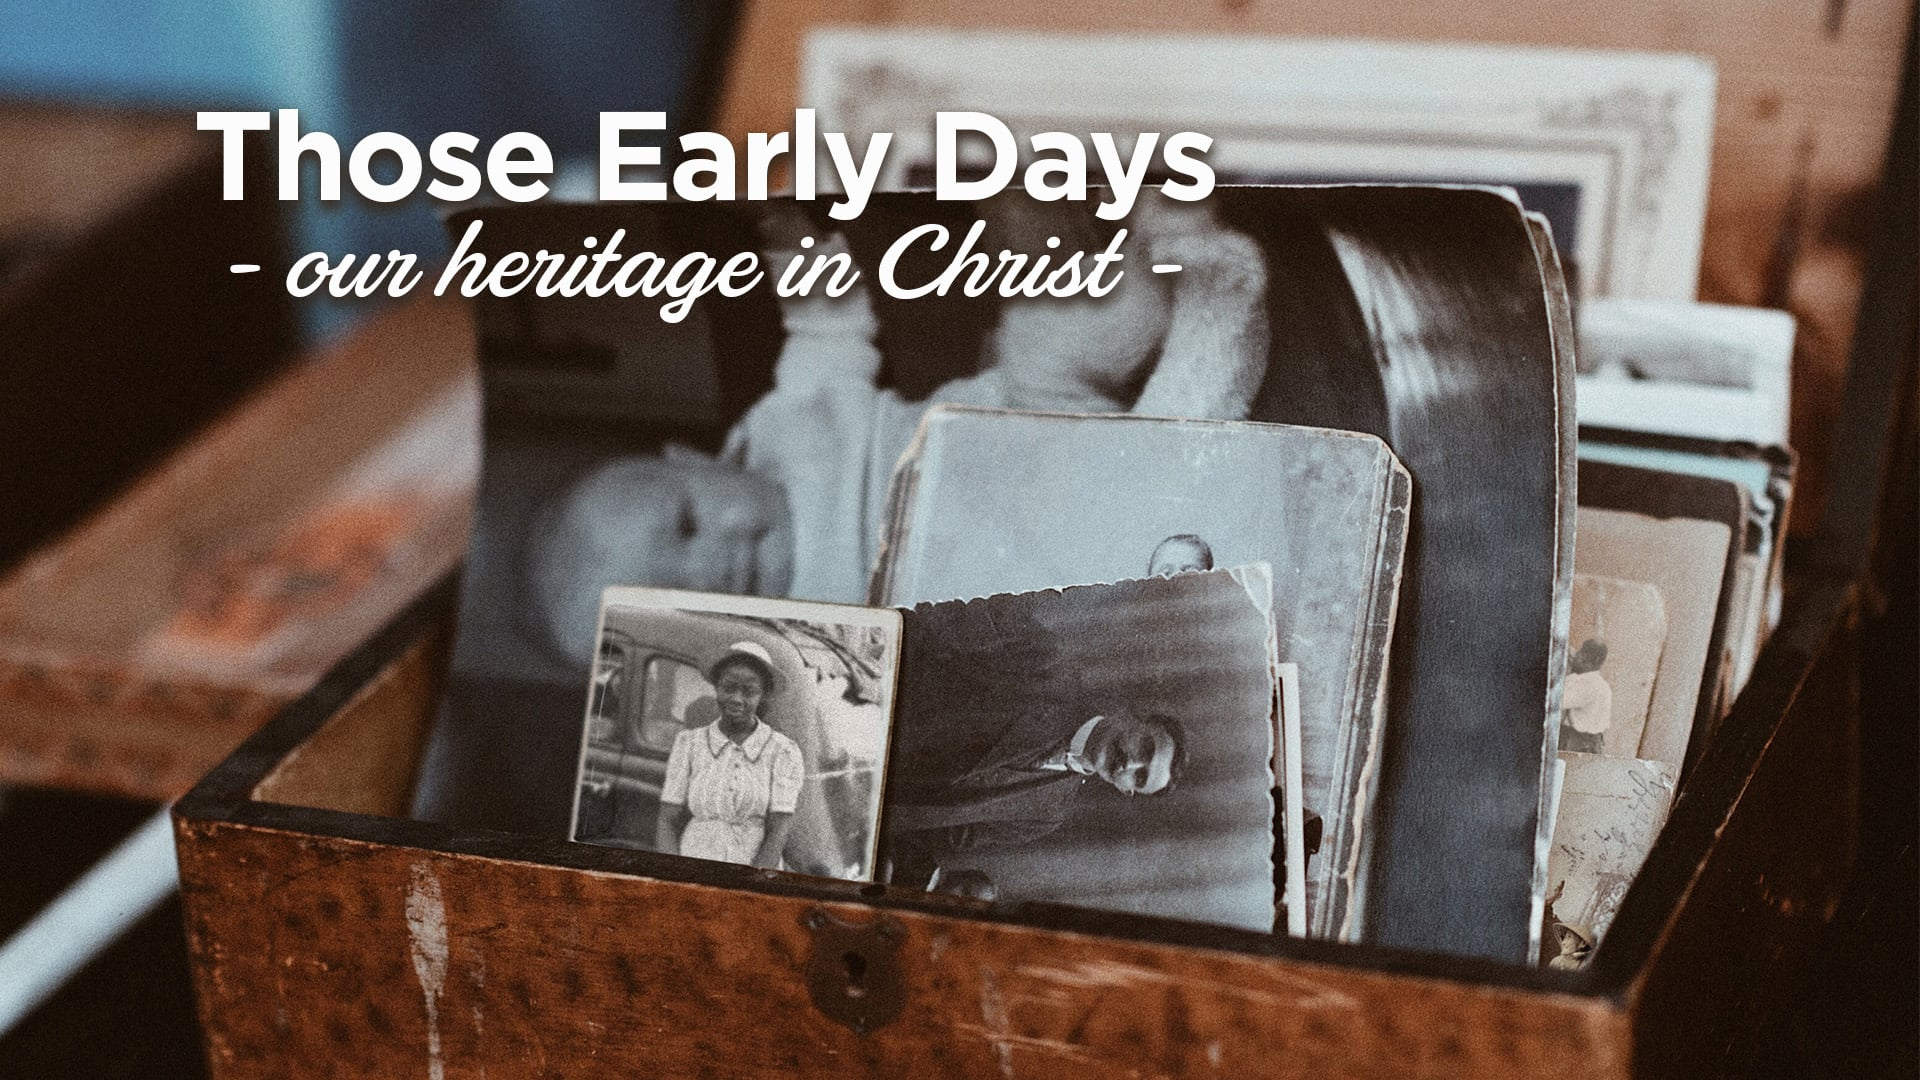 Those Early Days - Progress